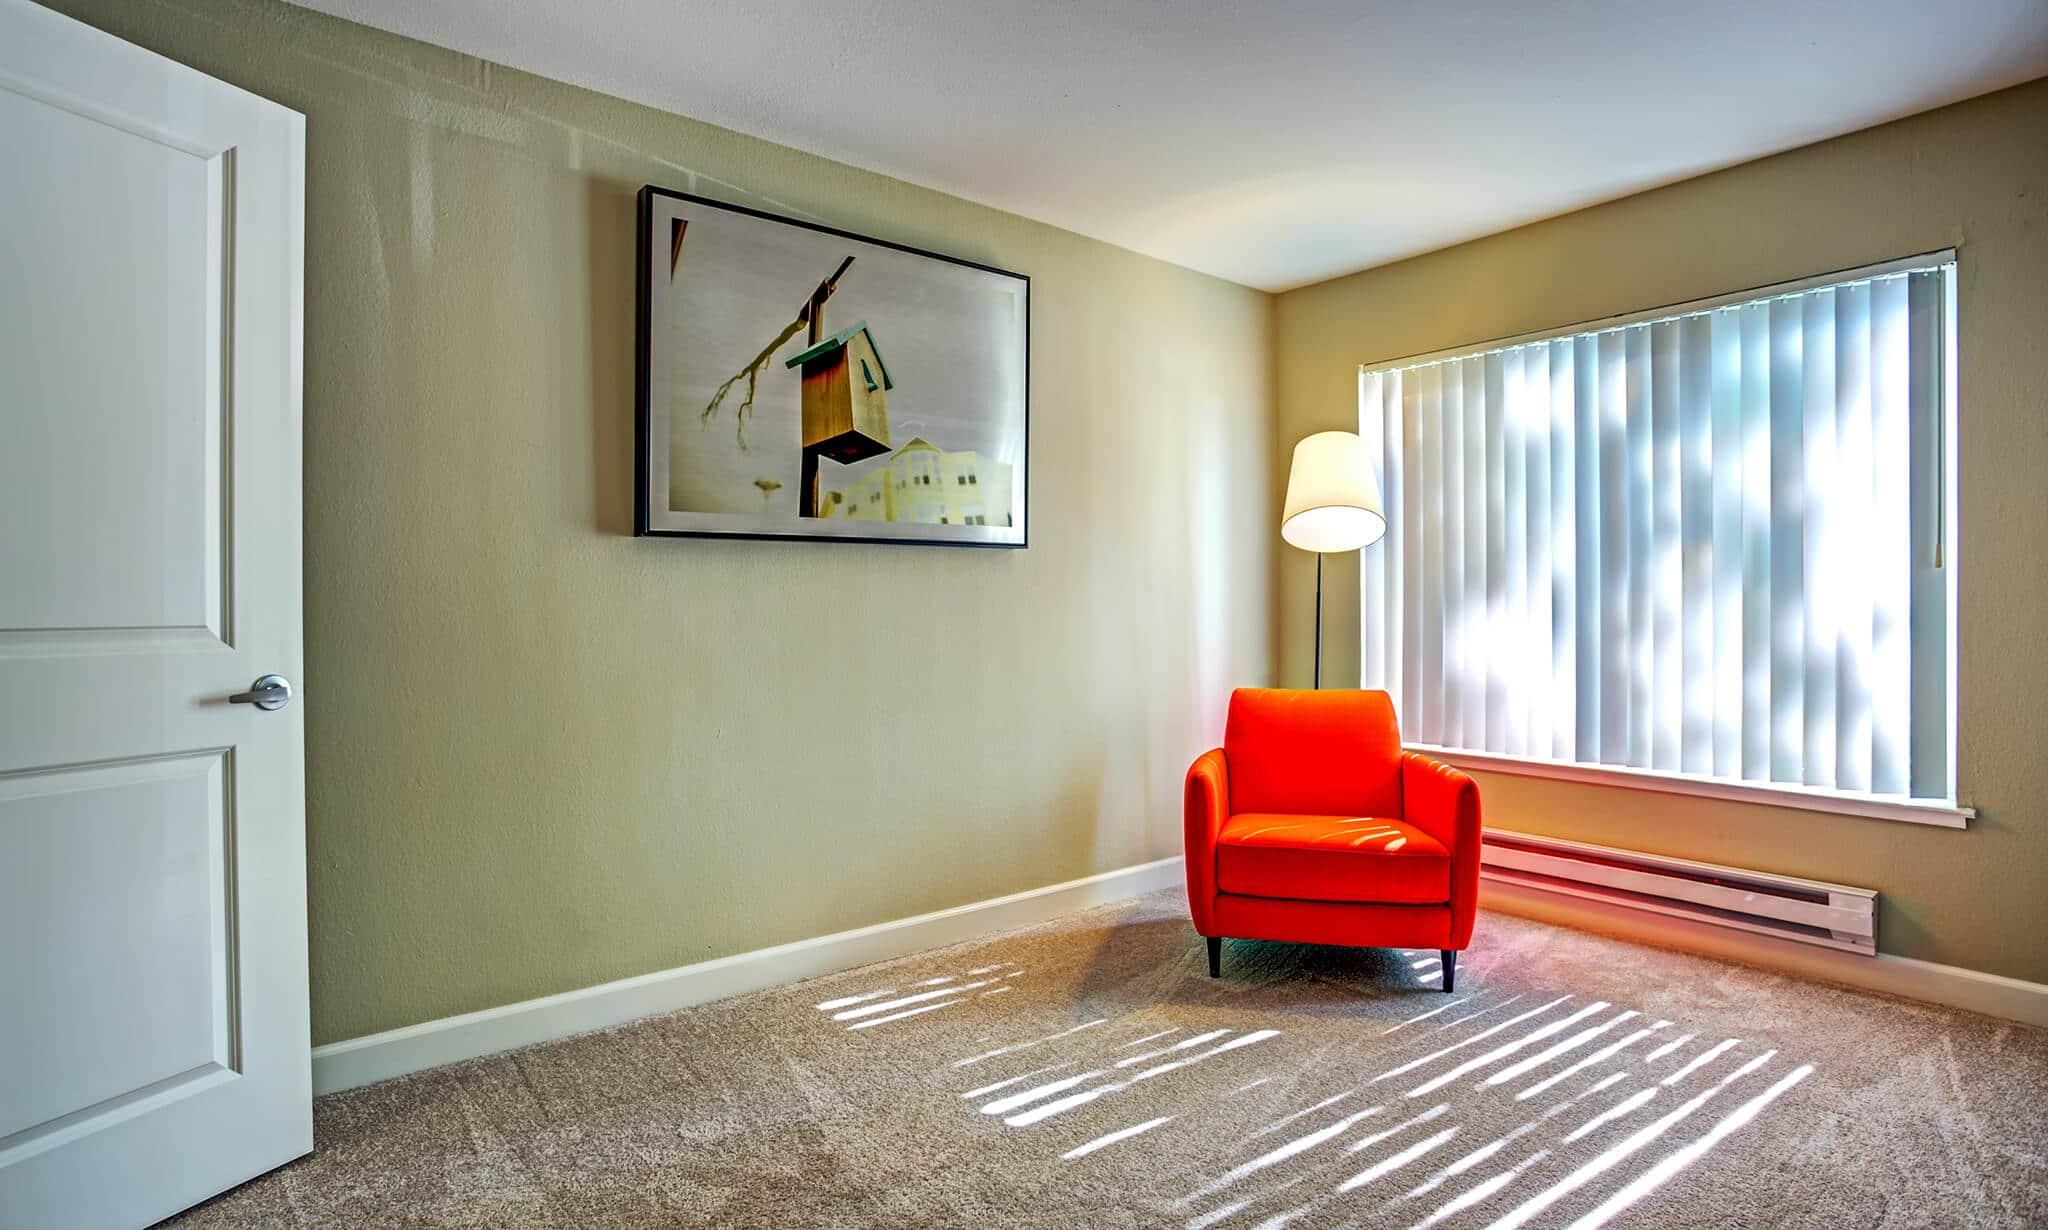 Alderwood Apartments apartments in Santa Clara CA to rent photo 12